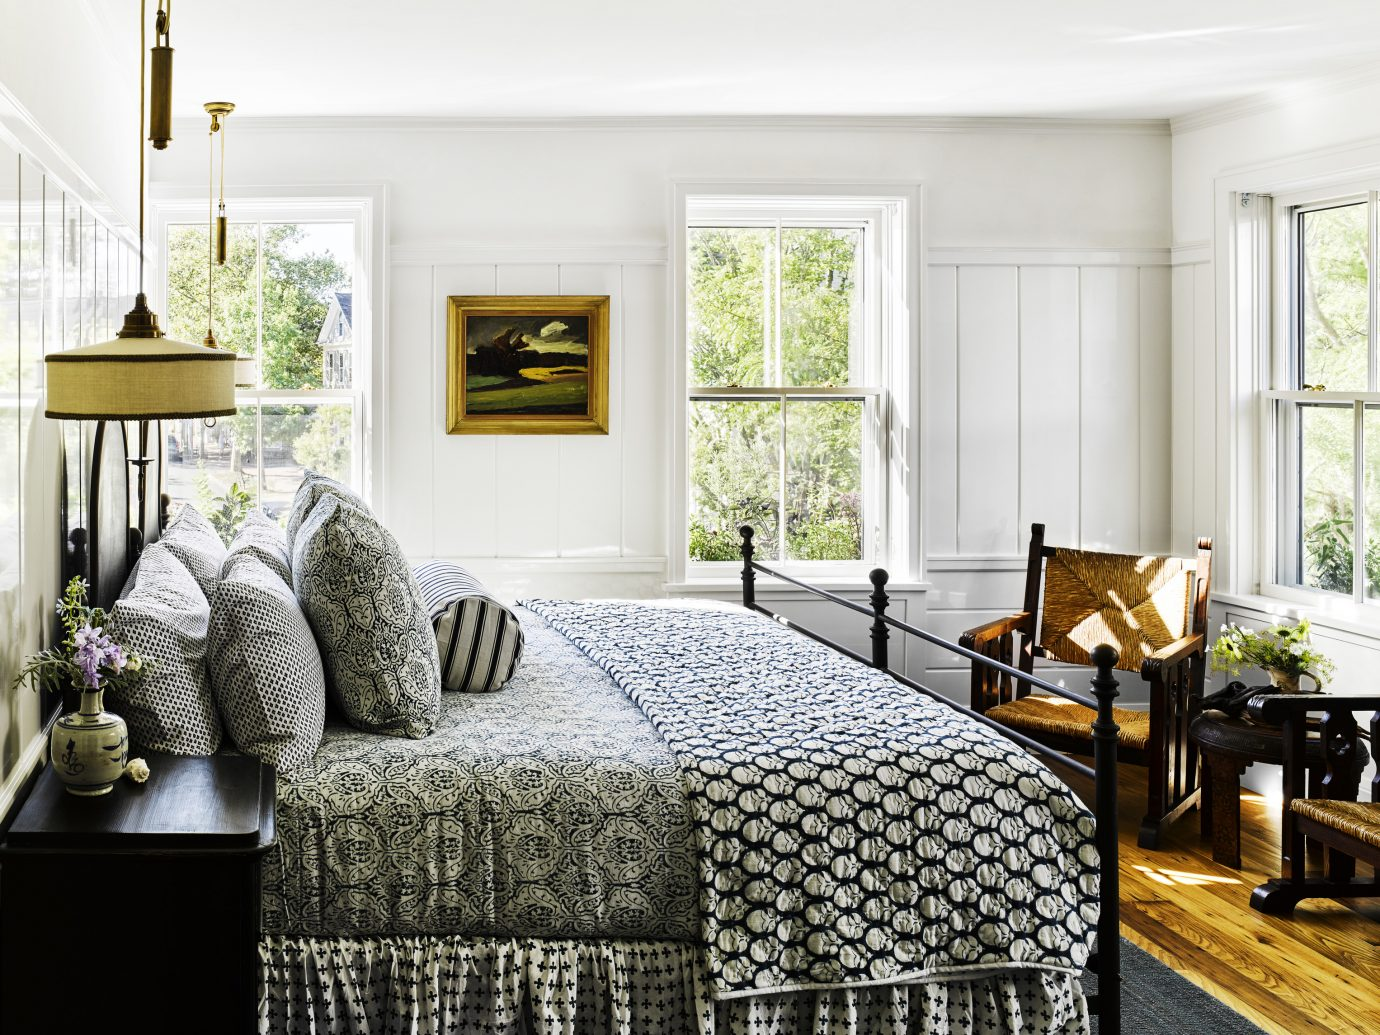 Bedroom at Greydon House